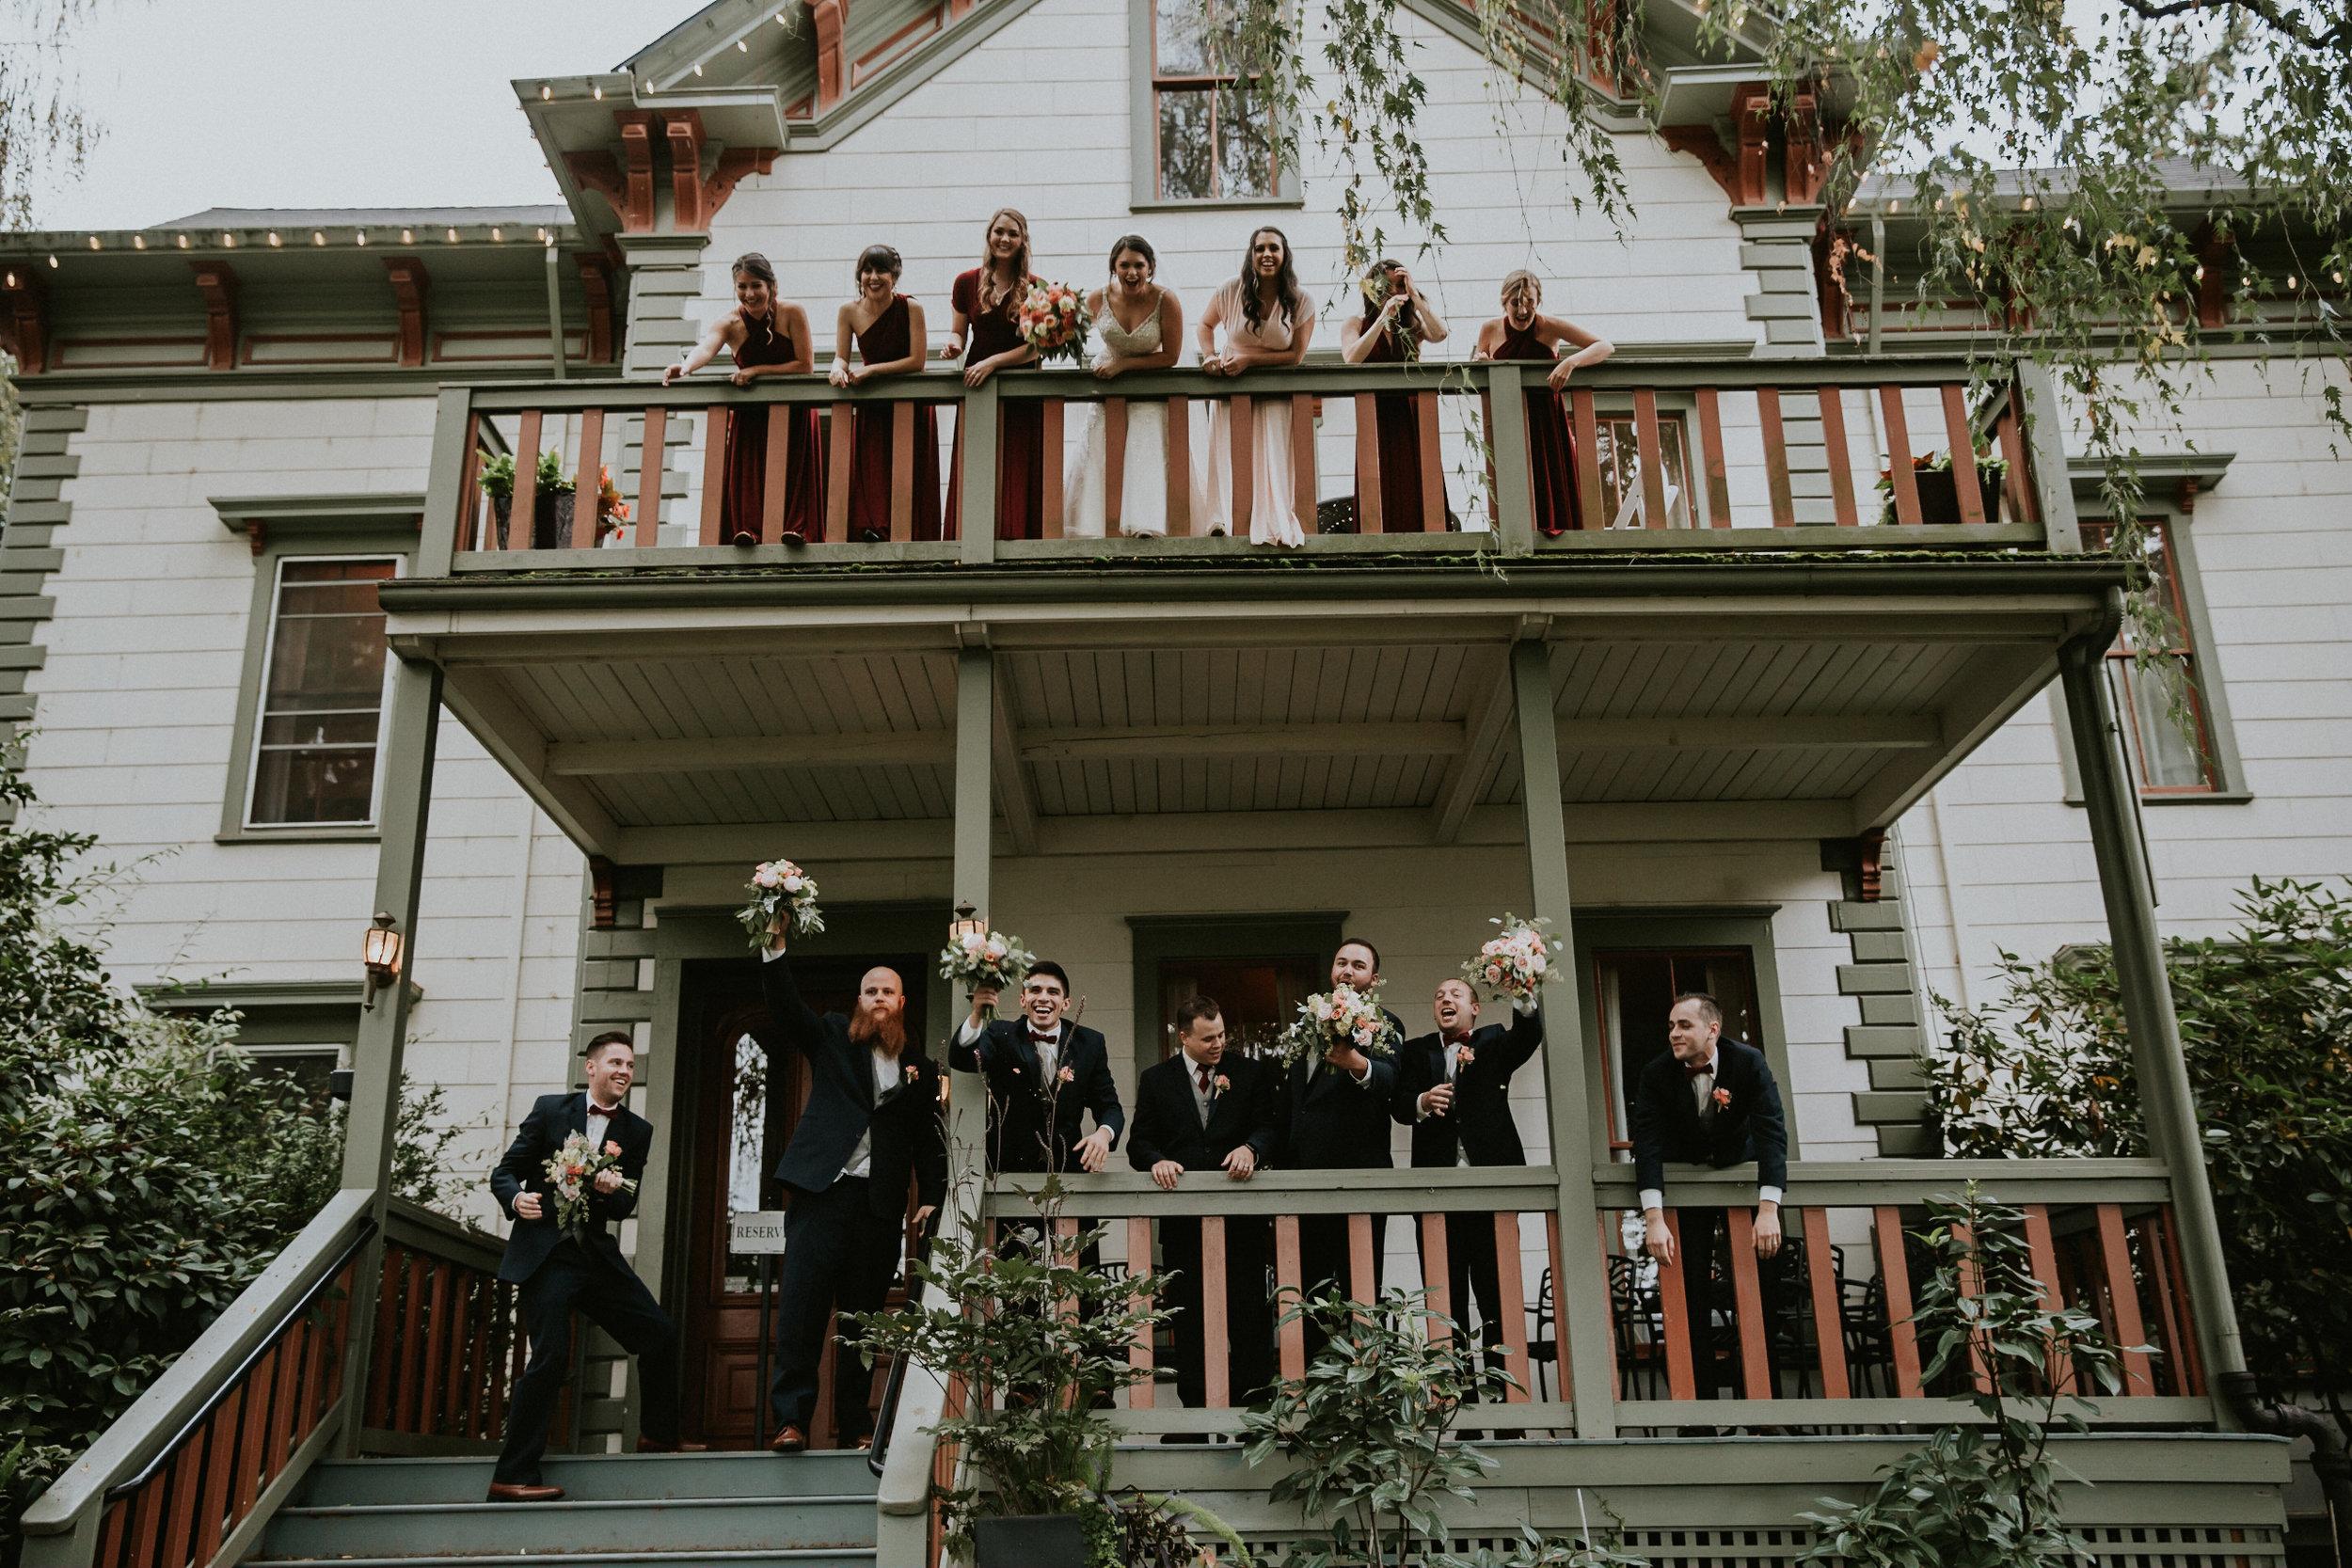 McMenamins_Cornelious_Pass_Roadhouse_wedding_photographer_AlfredTang-10.jpg